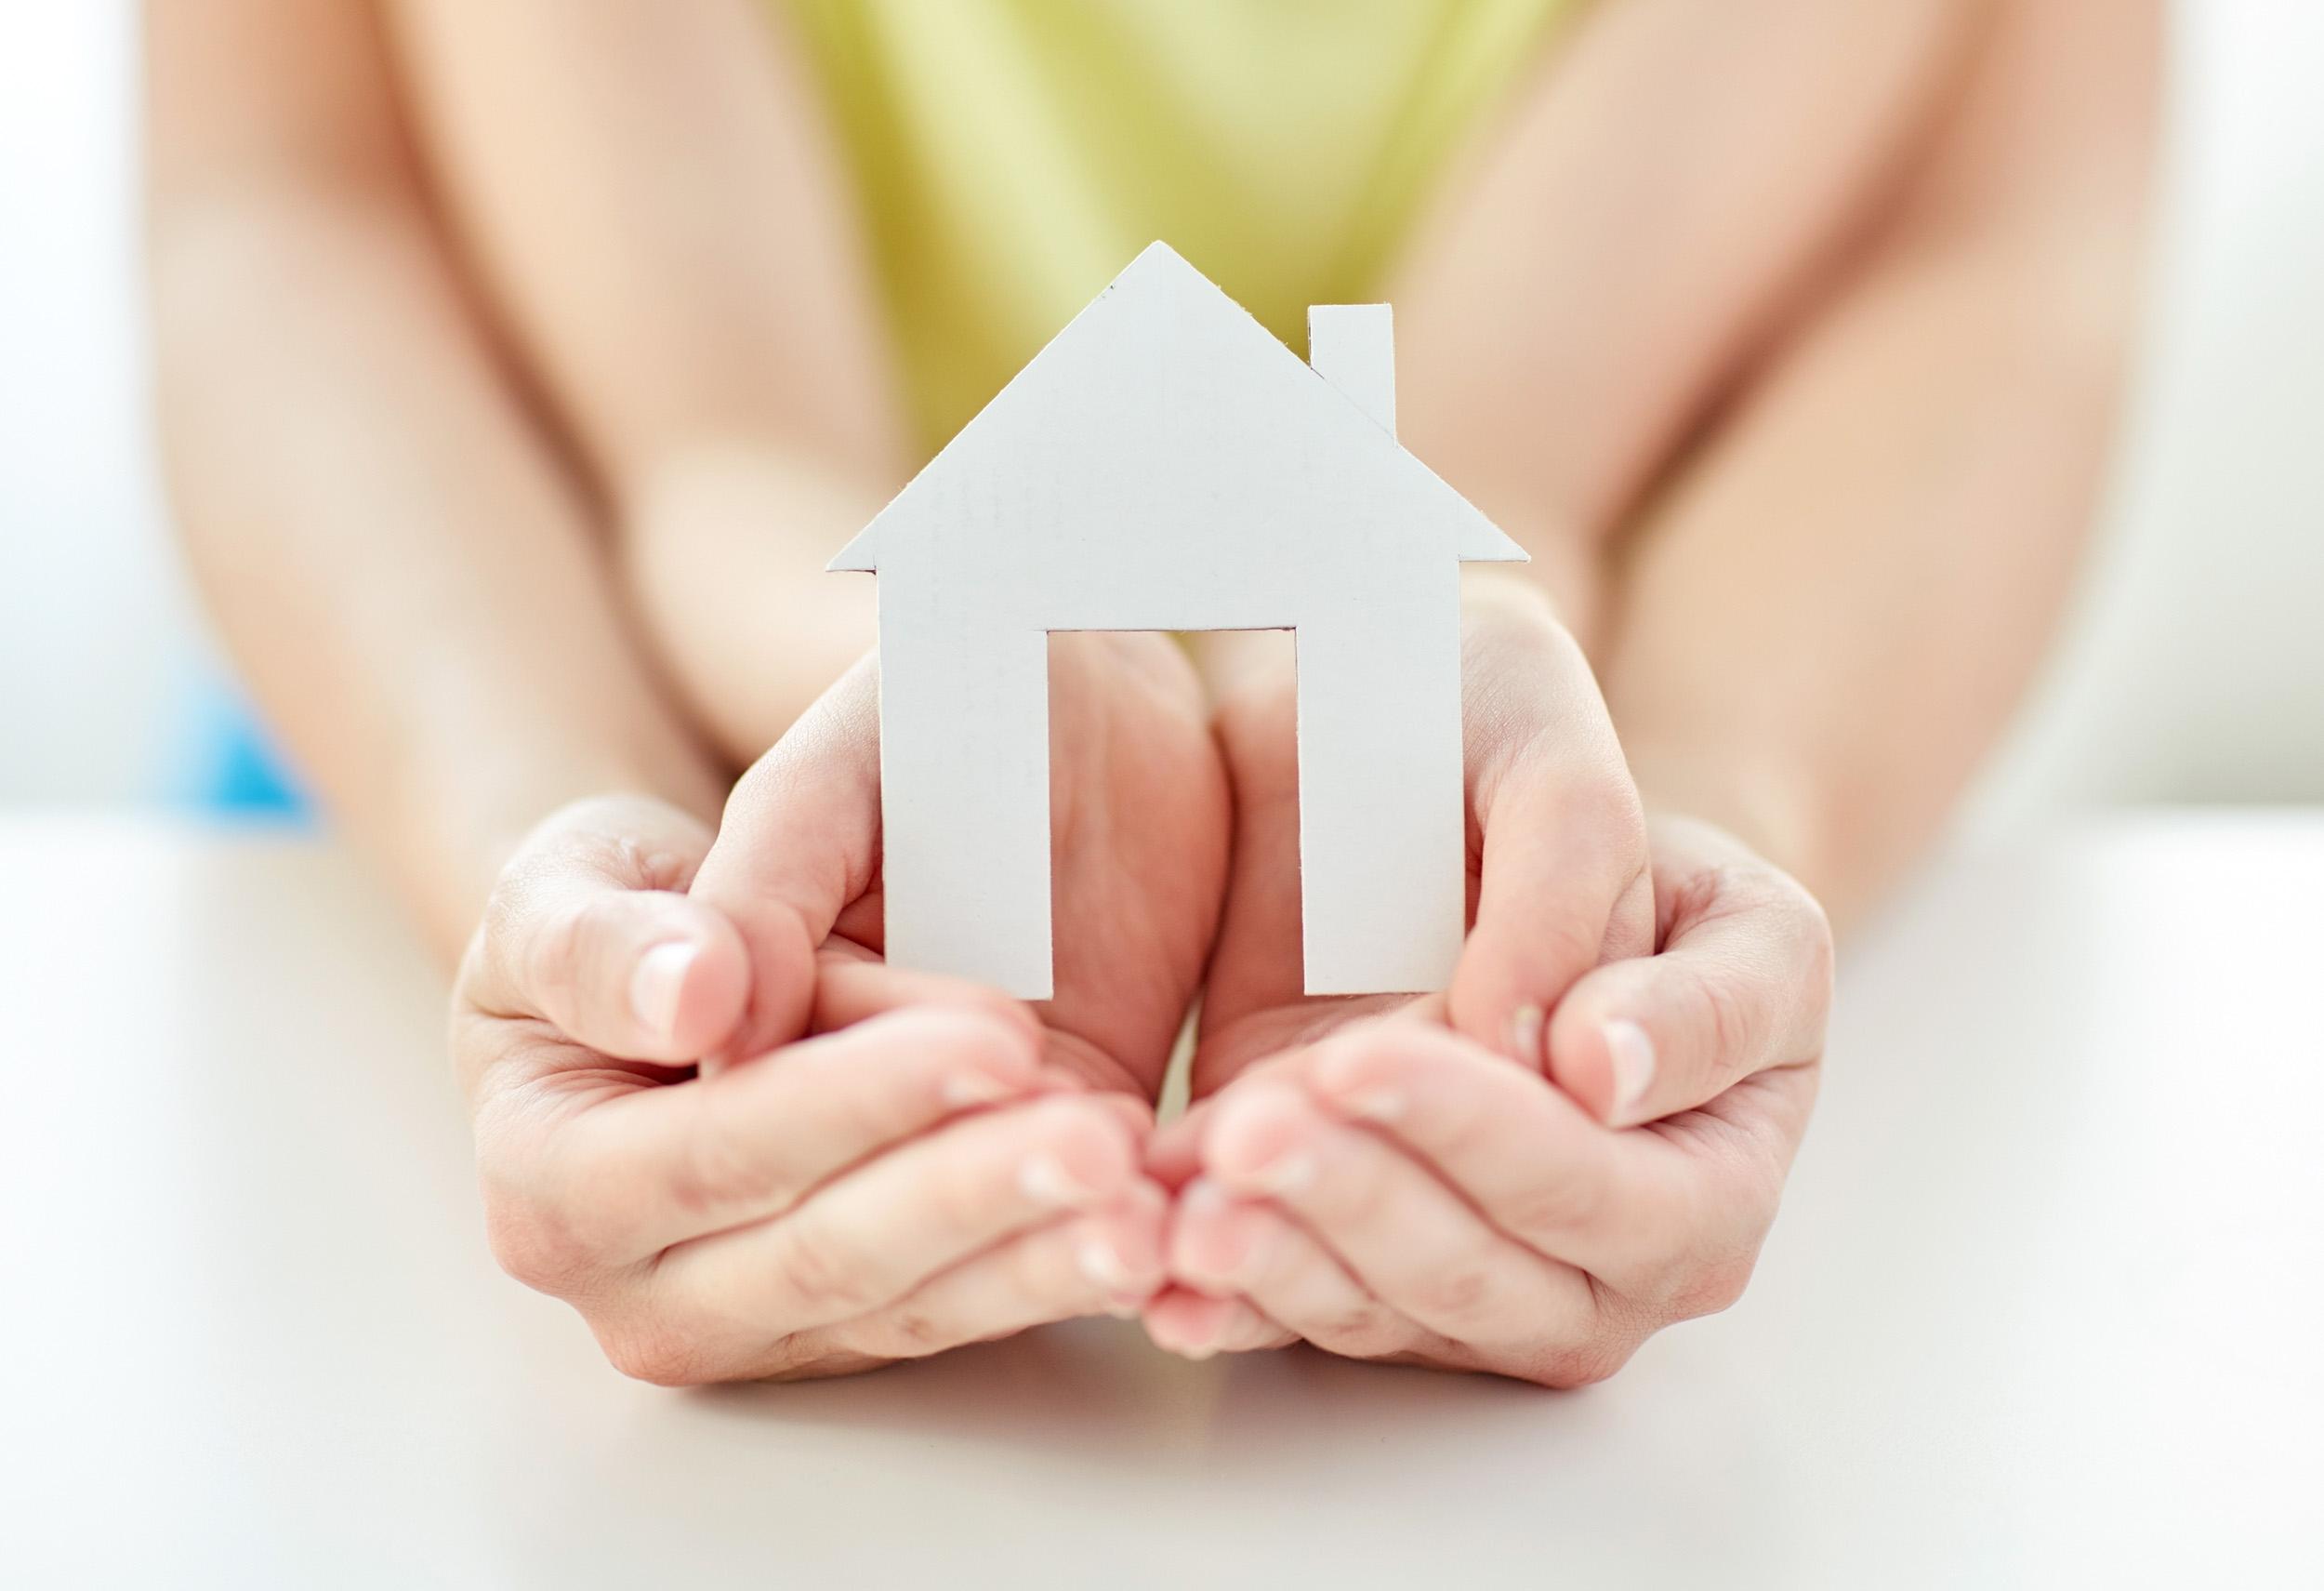 women hands paper house adoption grief care manitoba.jpg